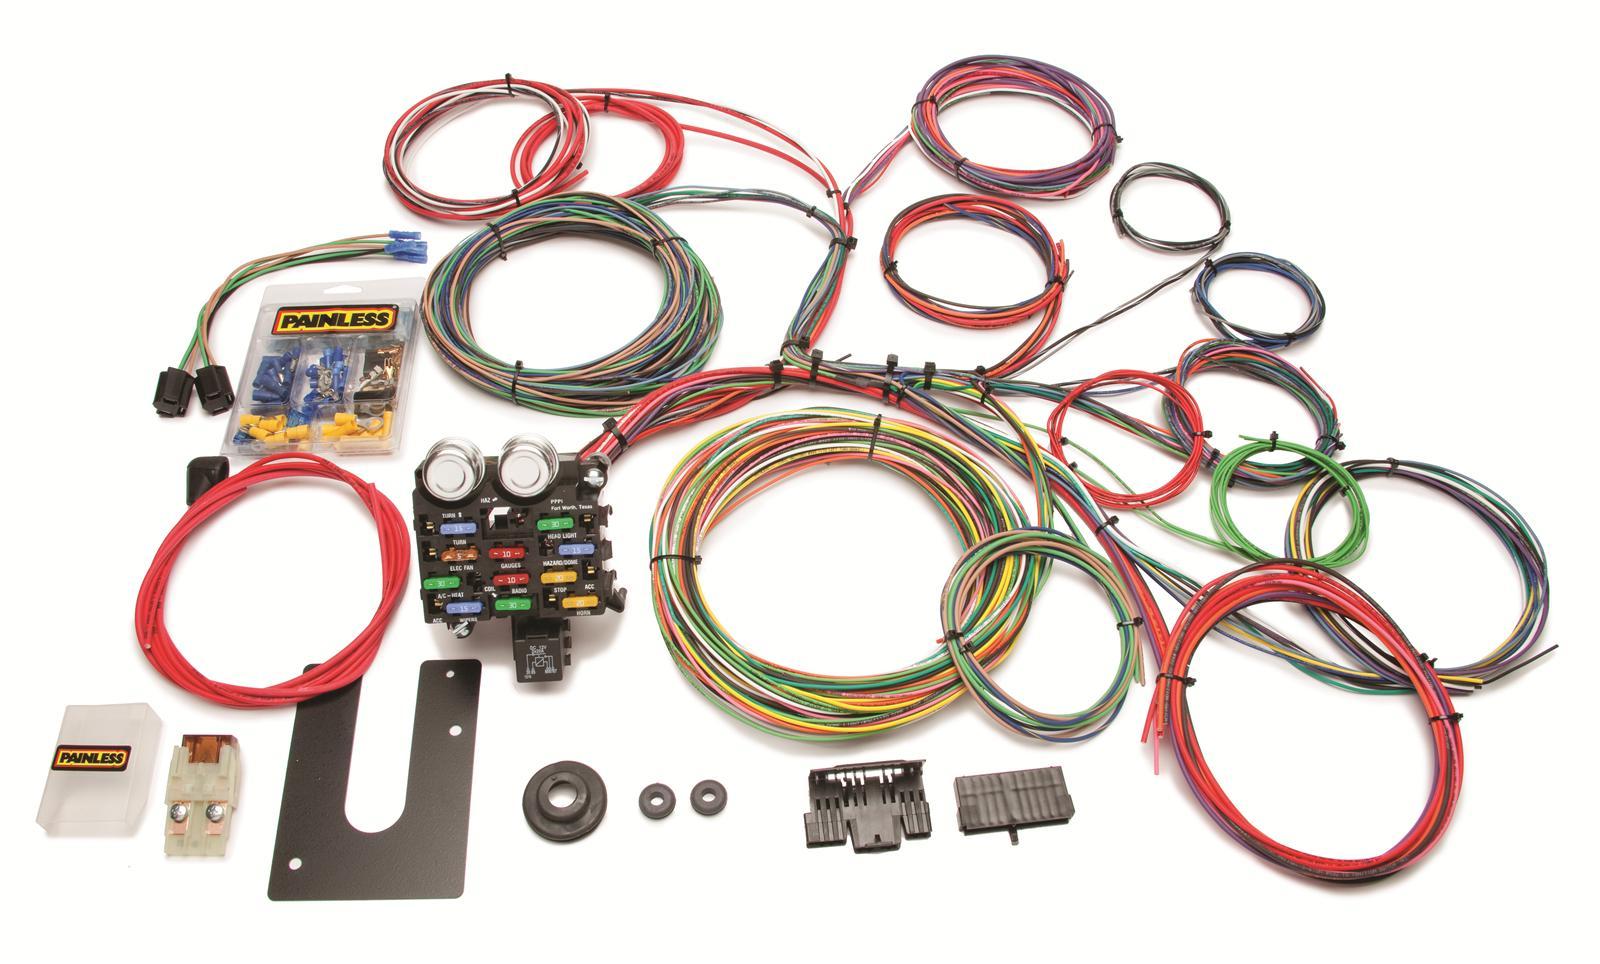 painless wiring 2005 gmc sierra diagram 10102 universal 12 circuit harnesss ebay